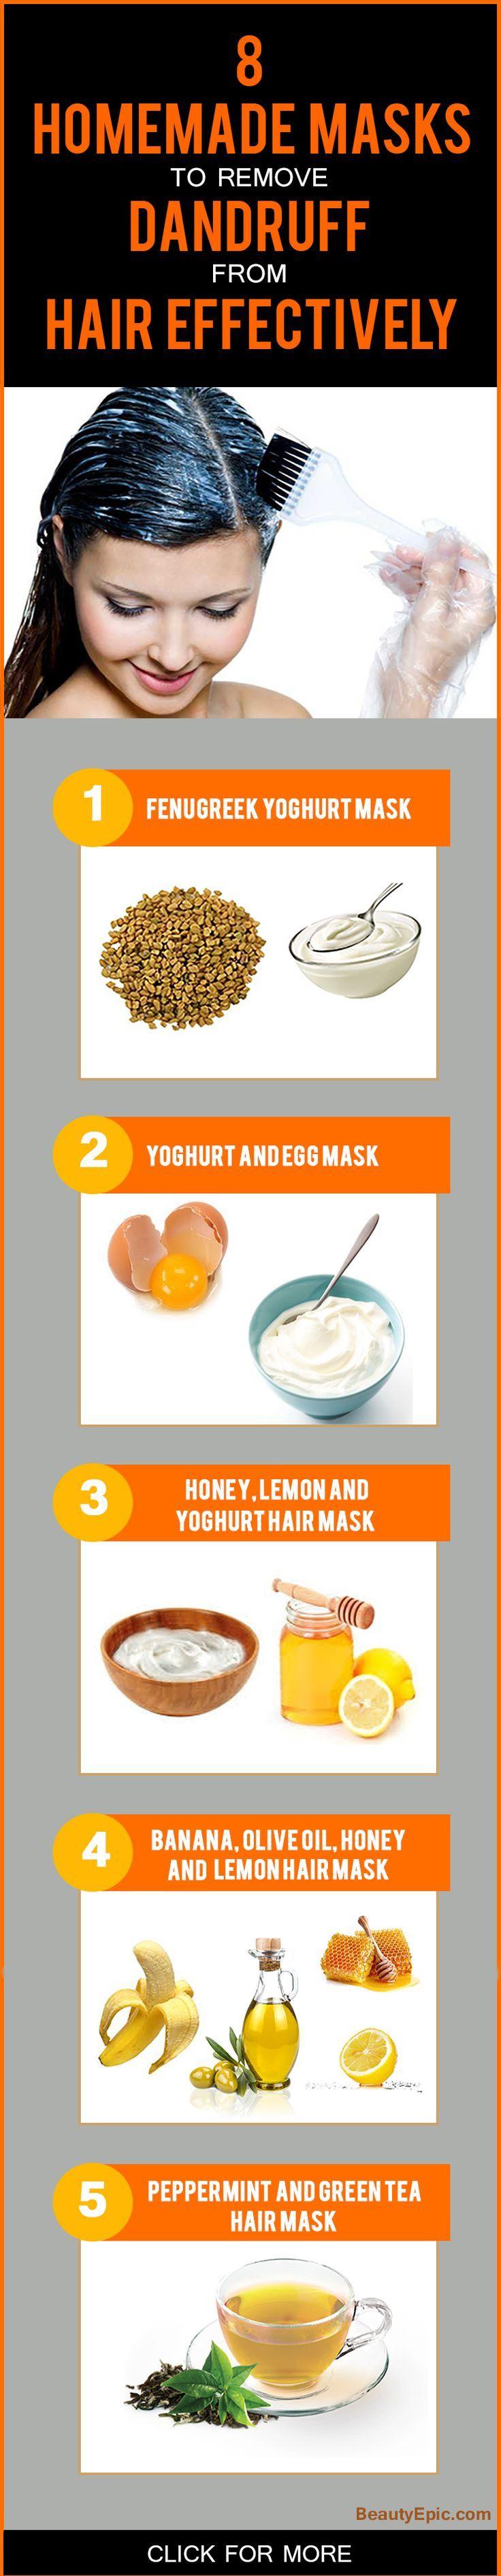 Homemade Hair Masks For Dandruff Recipes And How To Apply Homemade Hair Products Hair Mask For Dandruff Diy Hair Mask For Dandruff